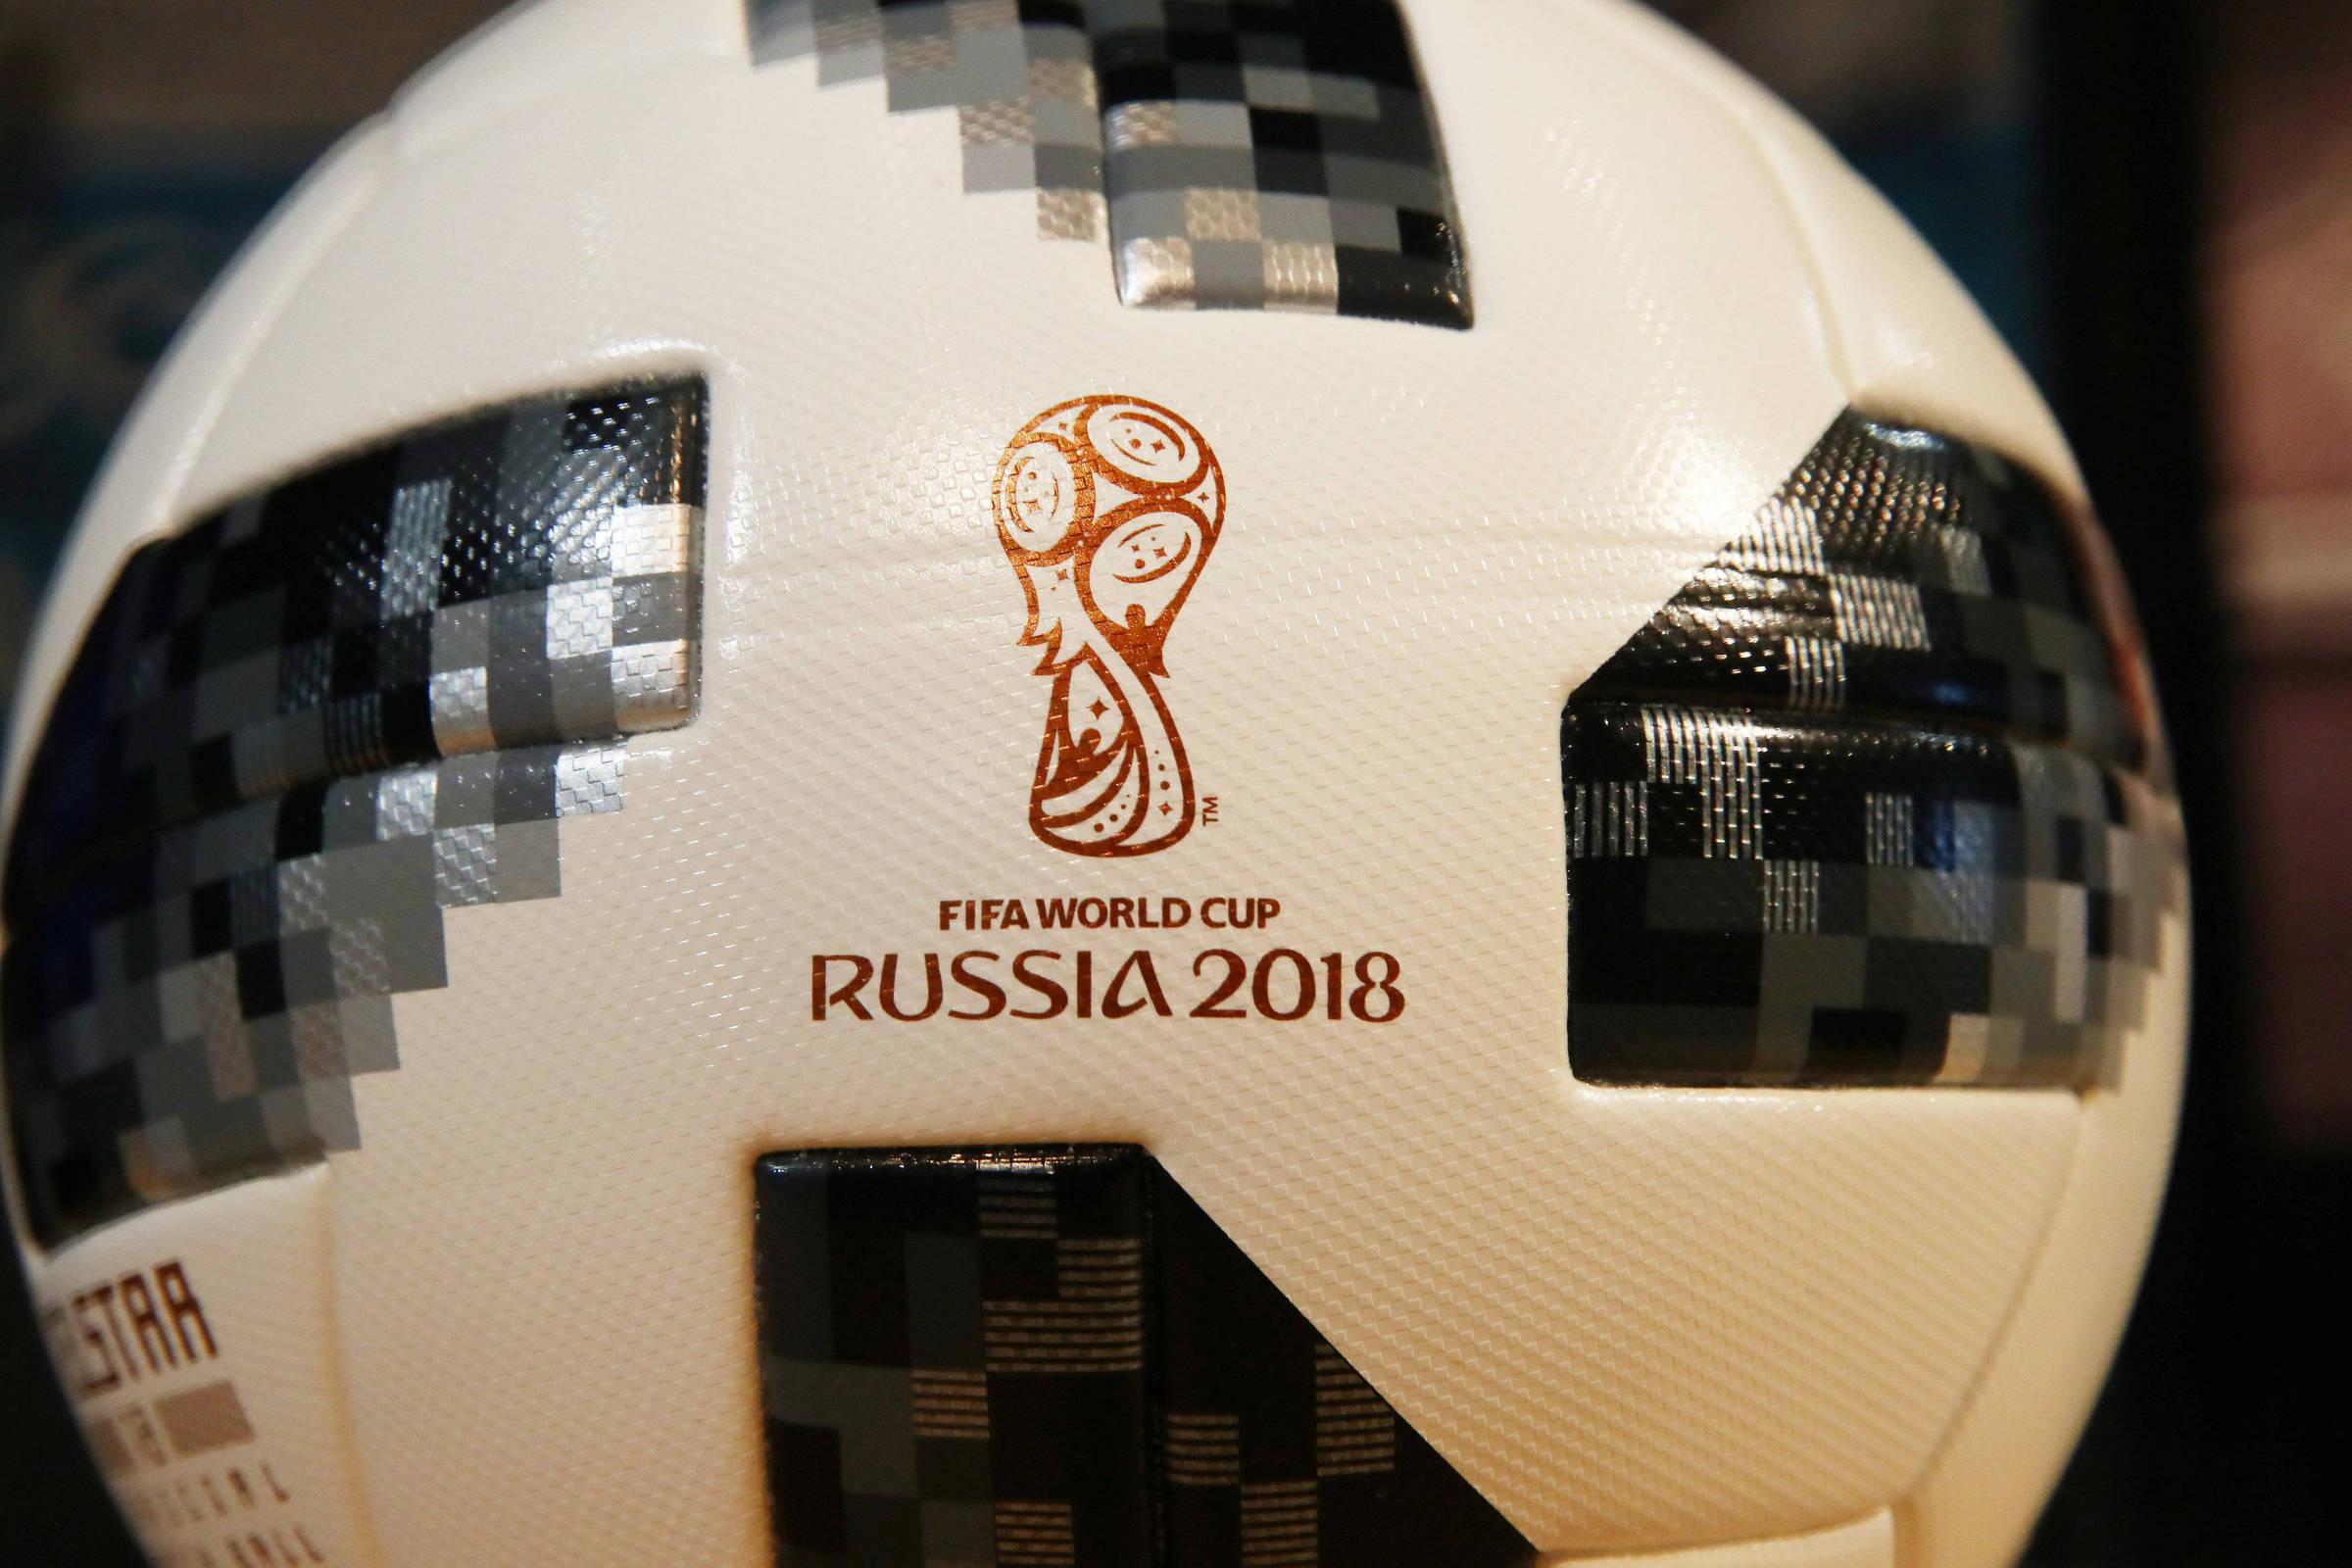 A Telstar-18, bola que será utilizada na Copa do Mundo da Rússia